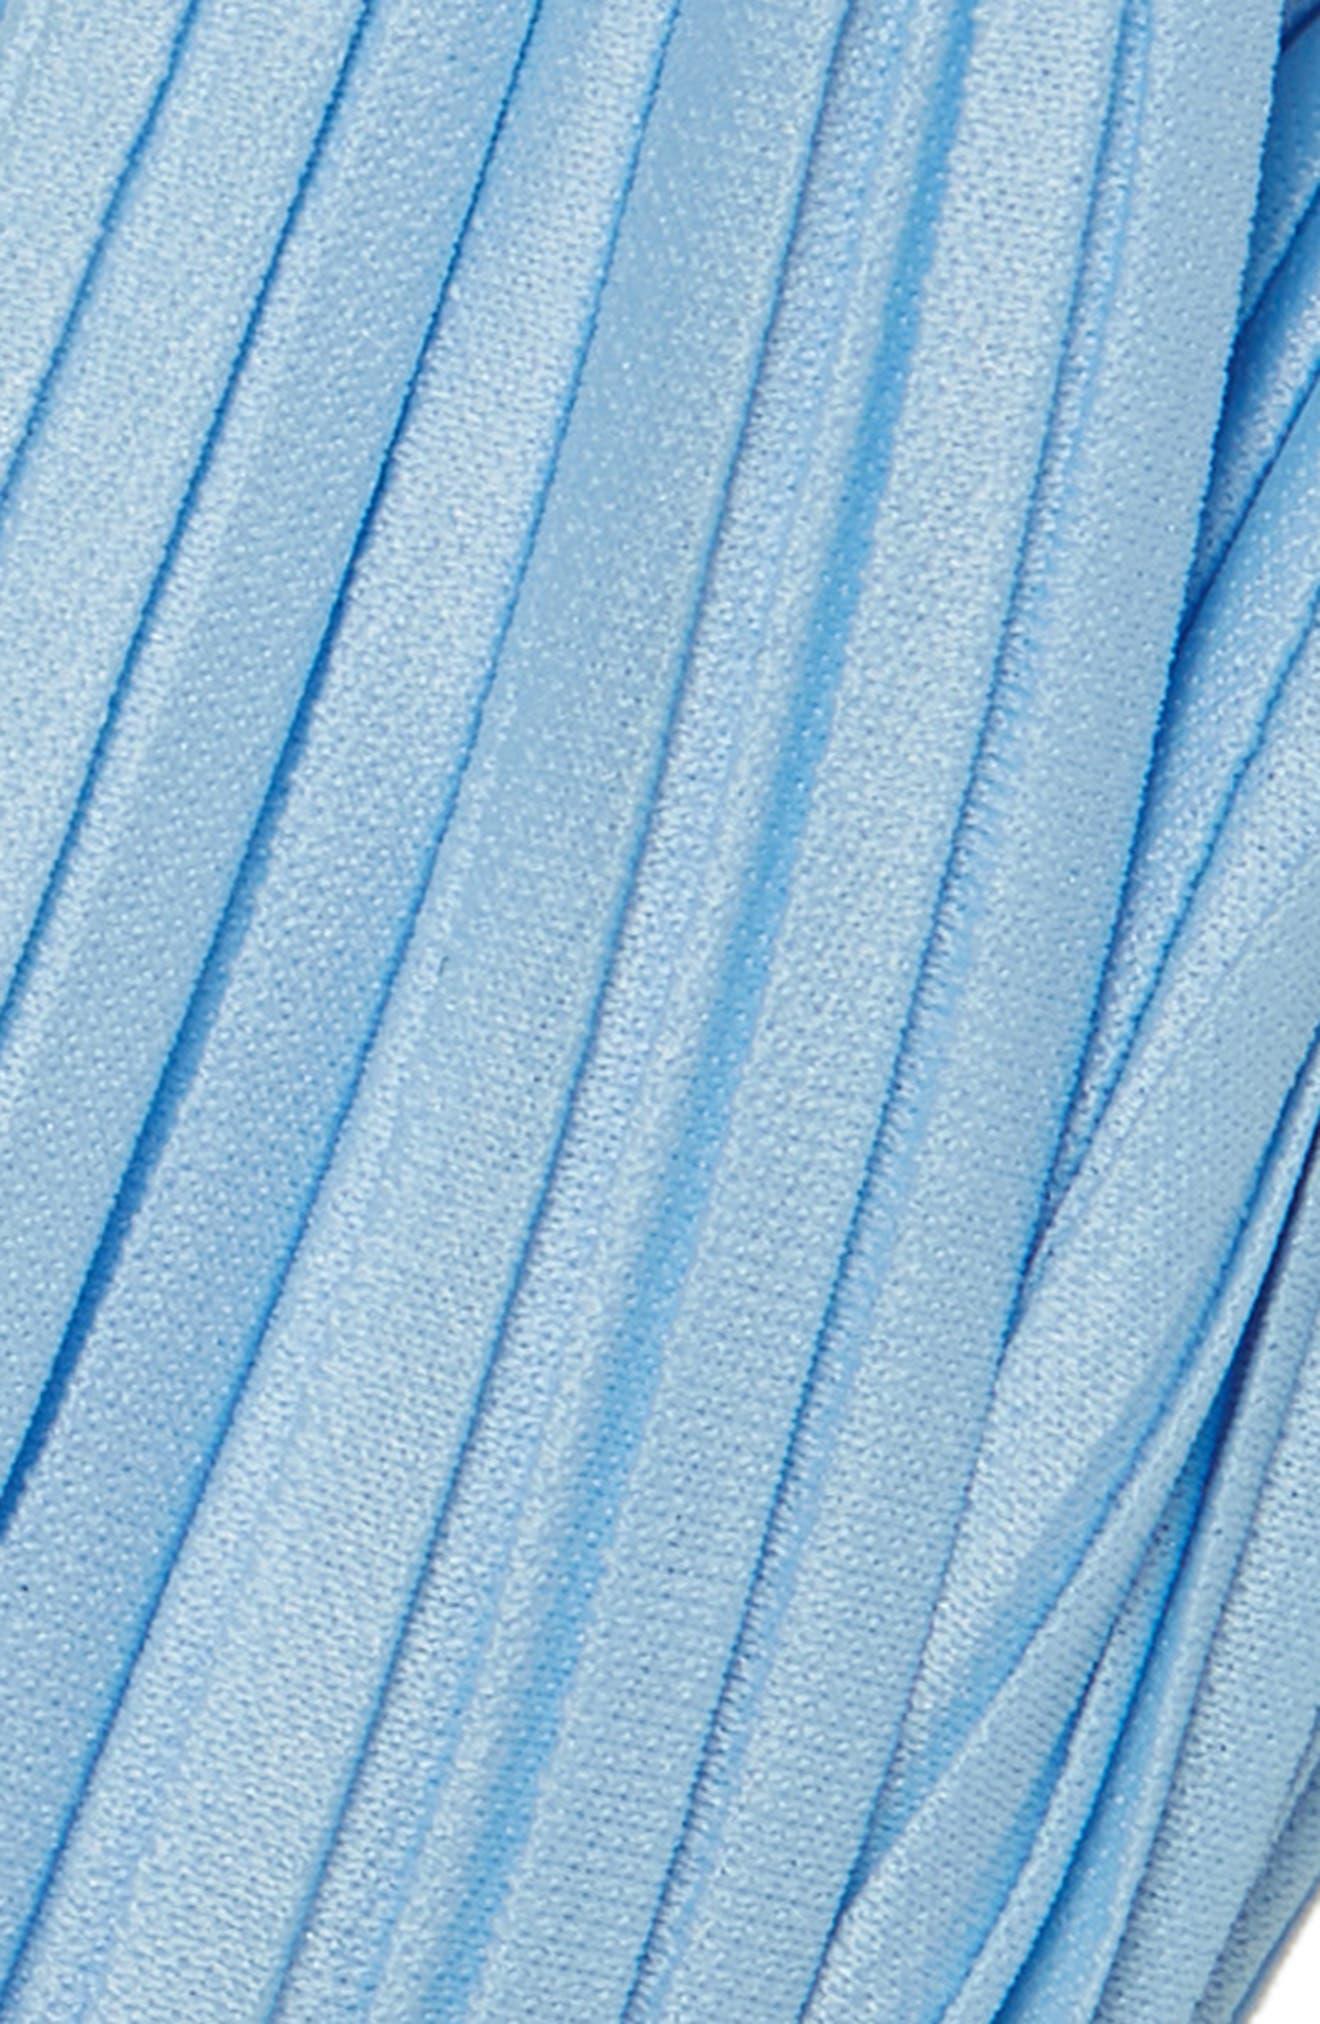 CARA, Pleated Turban Head Wrap, Alternate thumbnail 2, color, BLUE